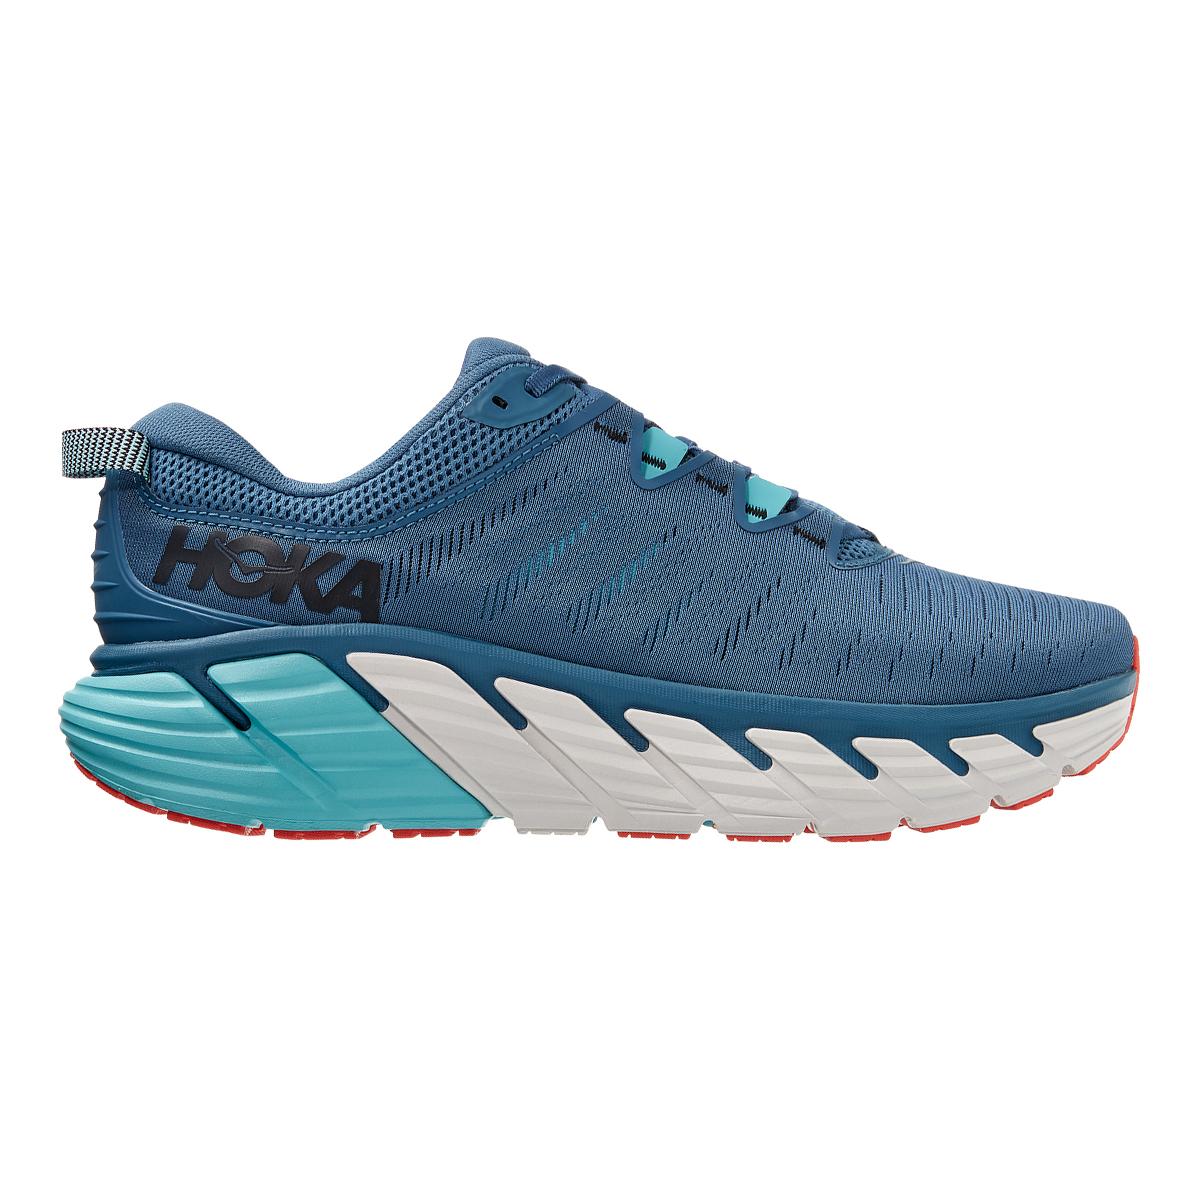 Men's Hoka One One Gaviota 3 Running Shoe - Color: Real Teal / Aquarelle - Size: 7 - Width: Regular, Real Teal / Aquarelle, large, image 1